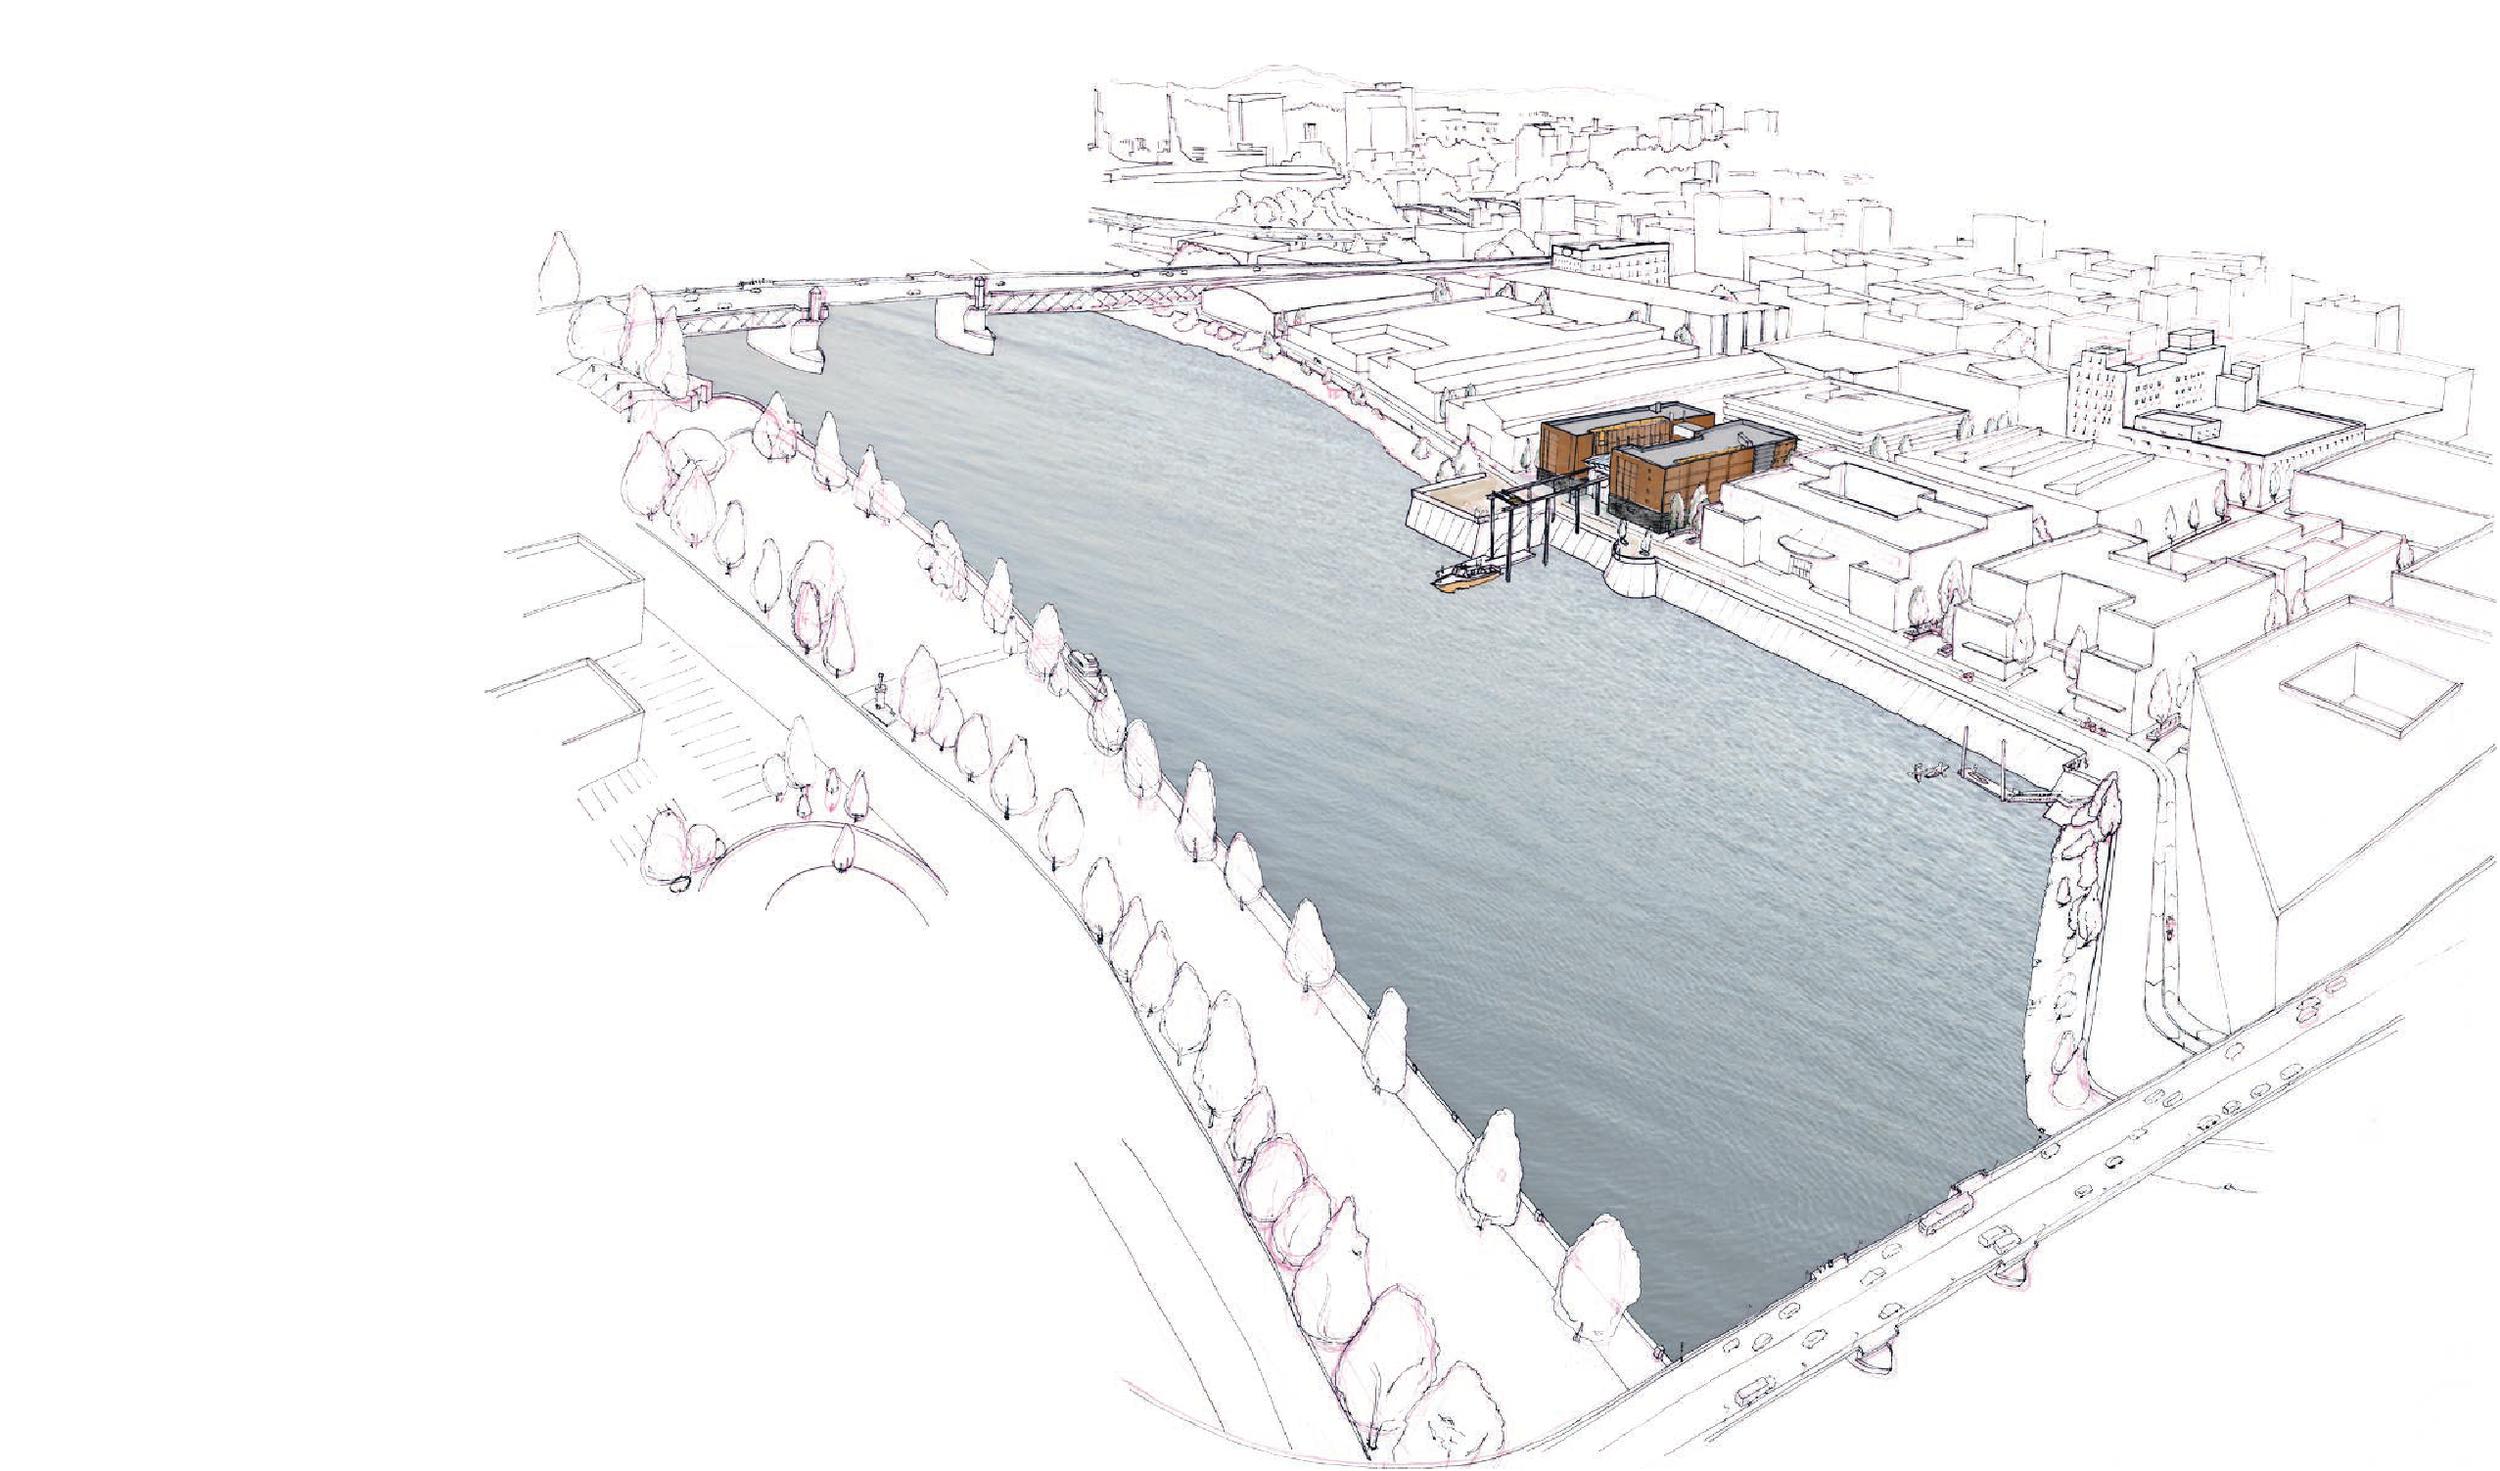 Hinge-Build-Group-Boat-Building-Willamette-River